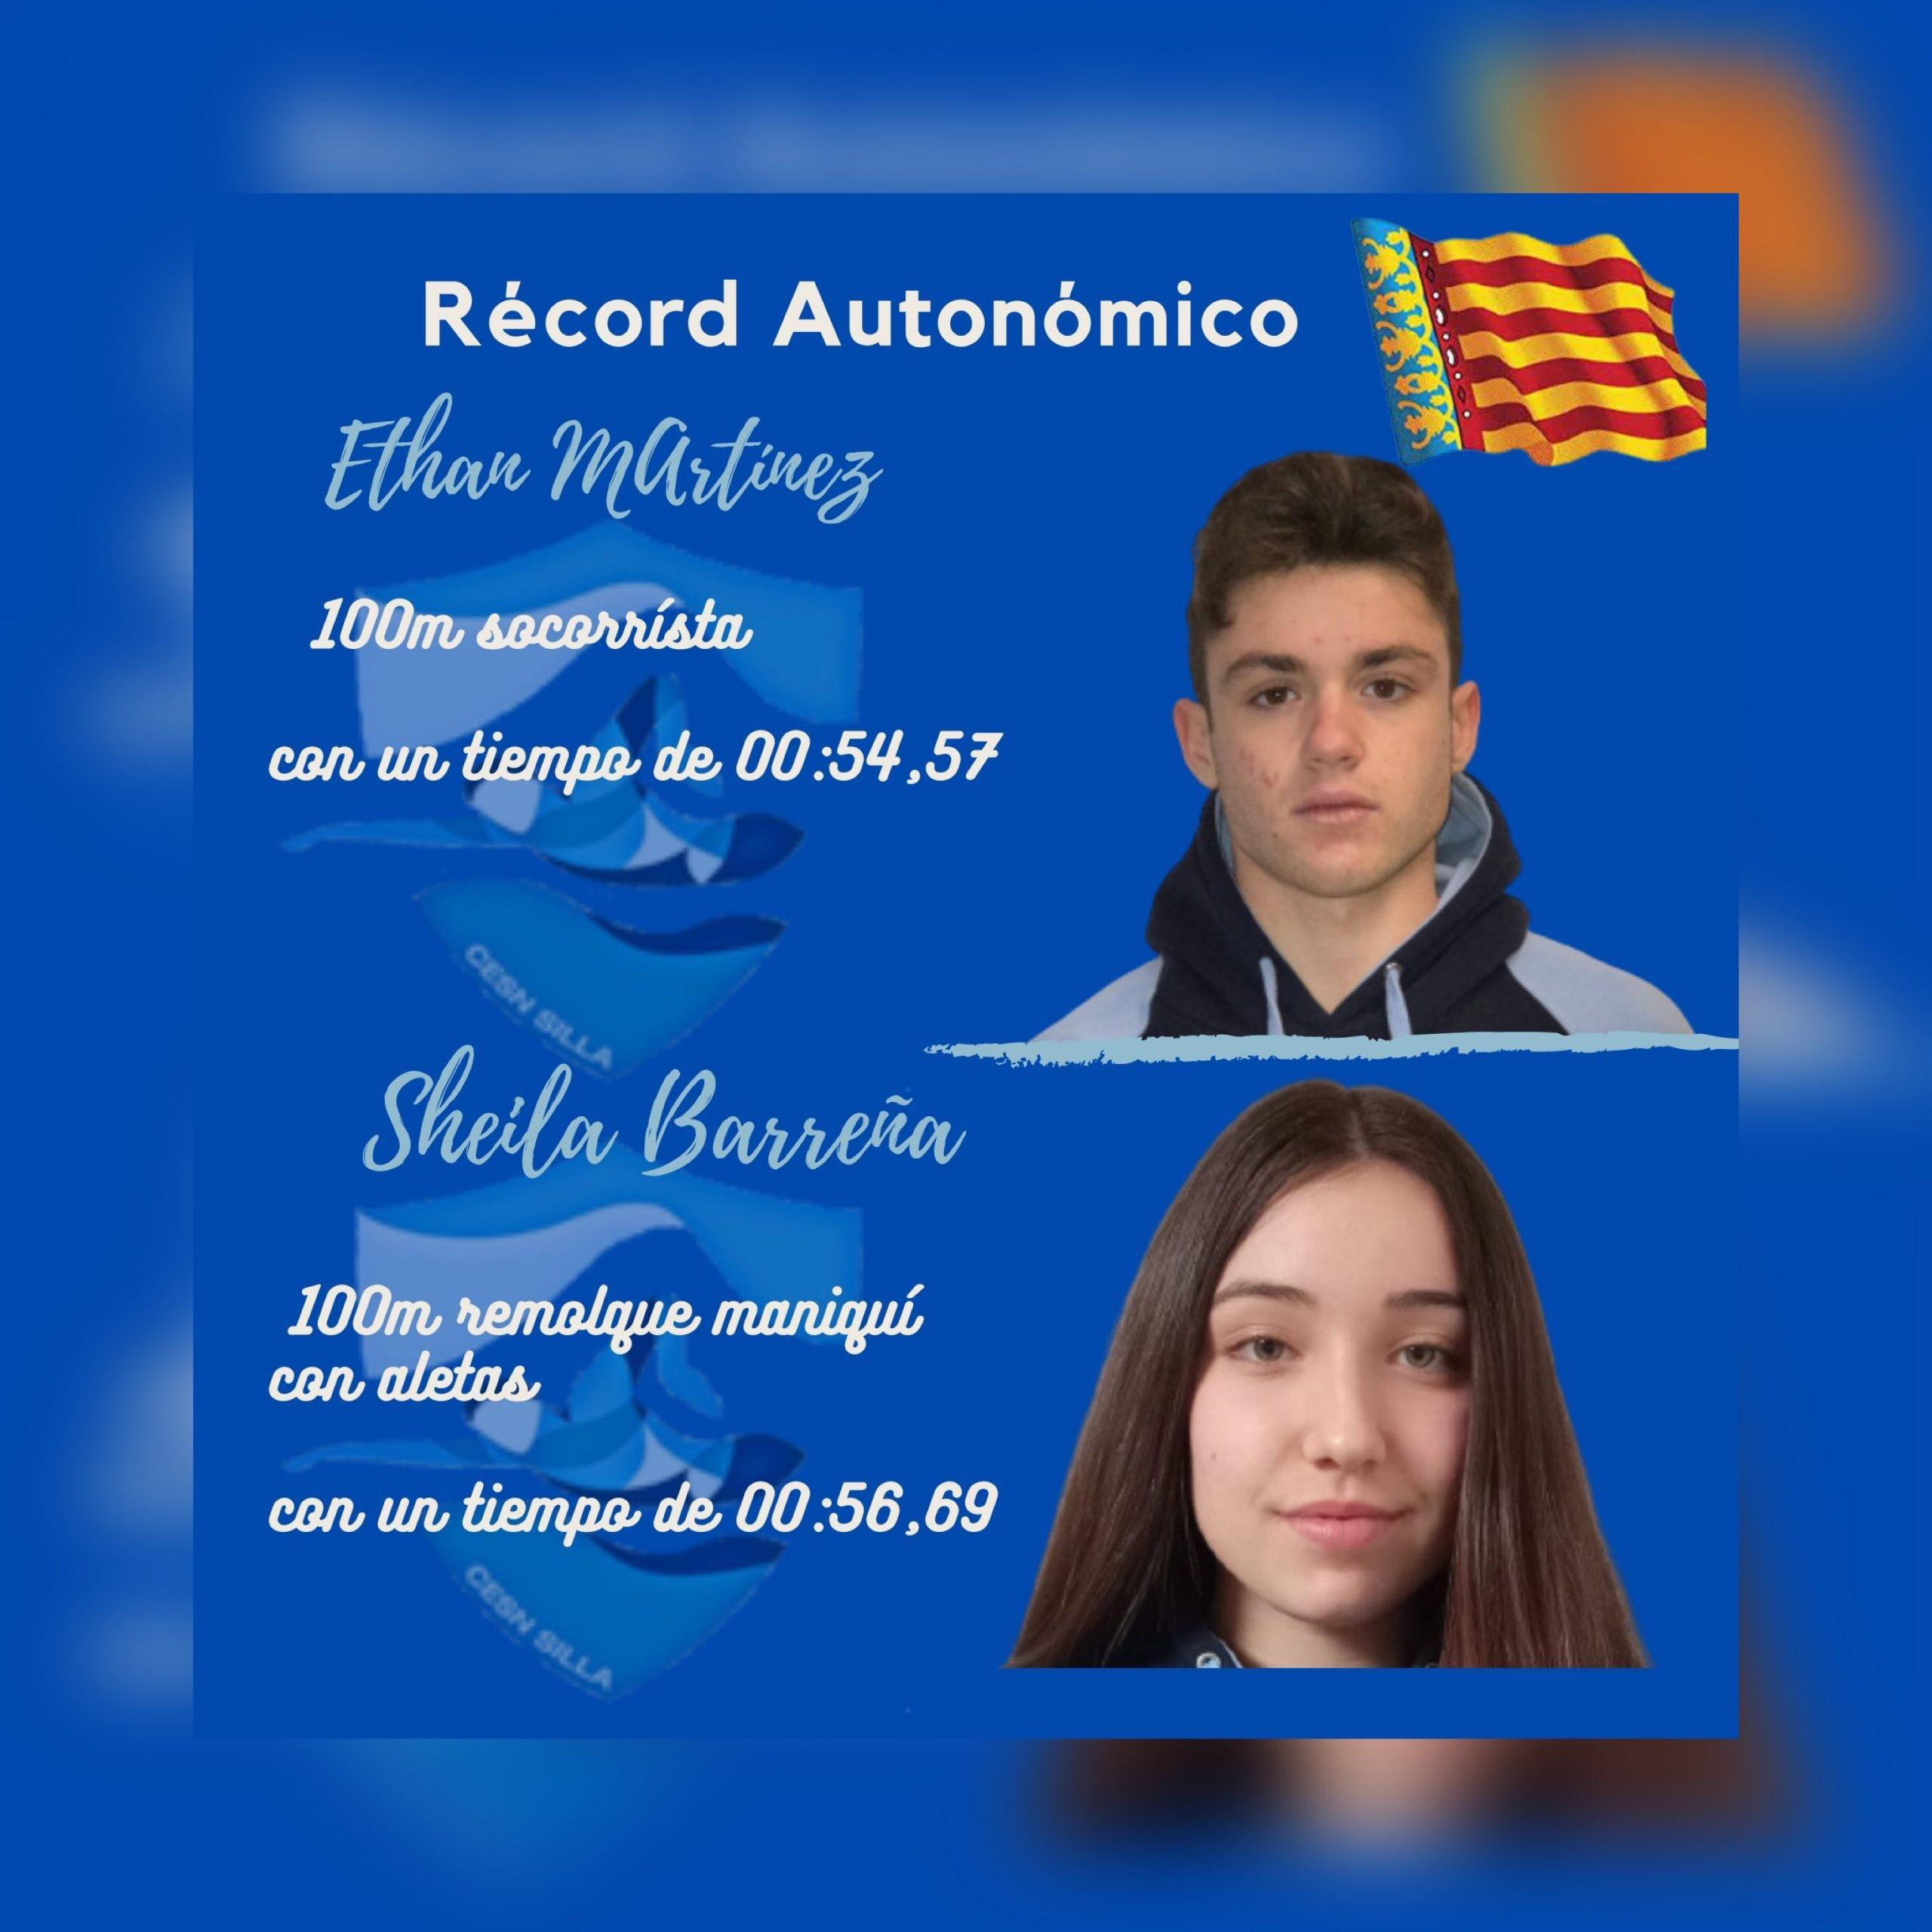 Récord Autonómico Ethan y Sheila